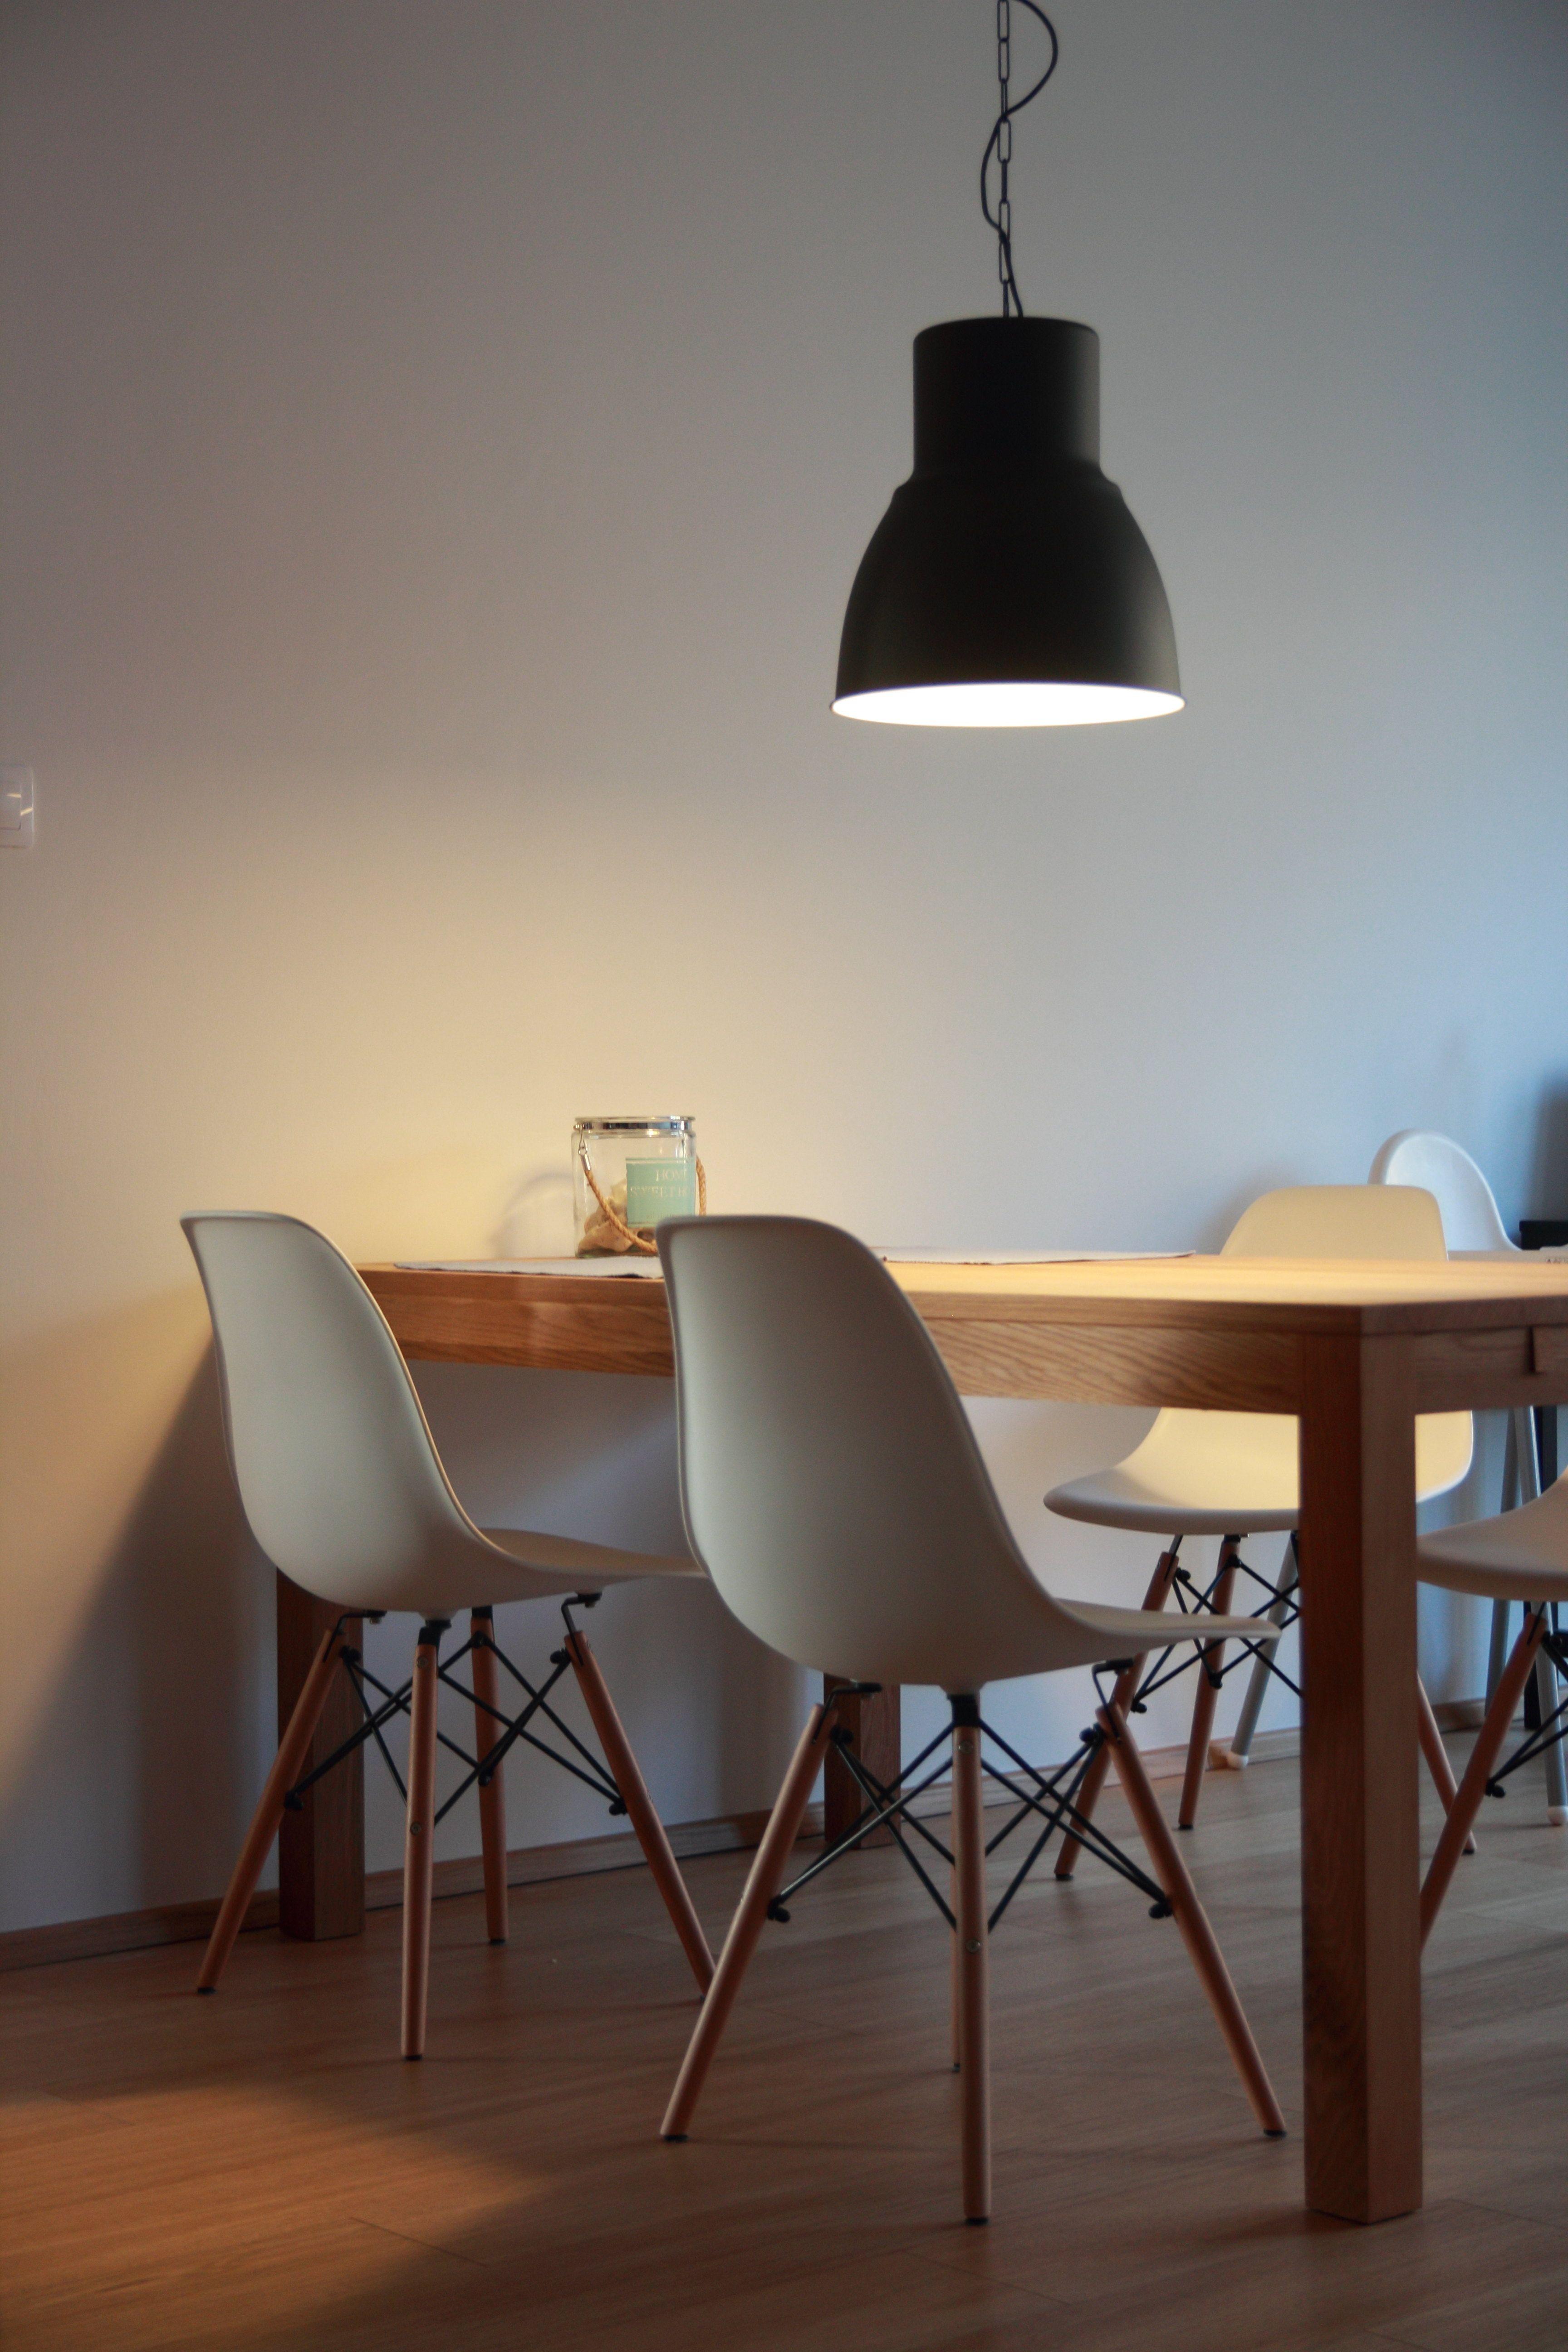 Hektar Lamp Dark Grey 38 Cm Ikea Oak Table Jysk White Chairs Wohnen Zimmer Lampe